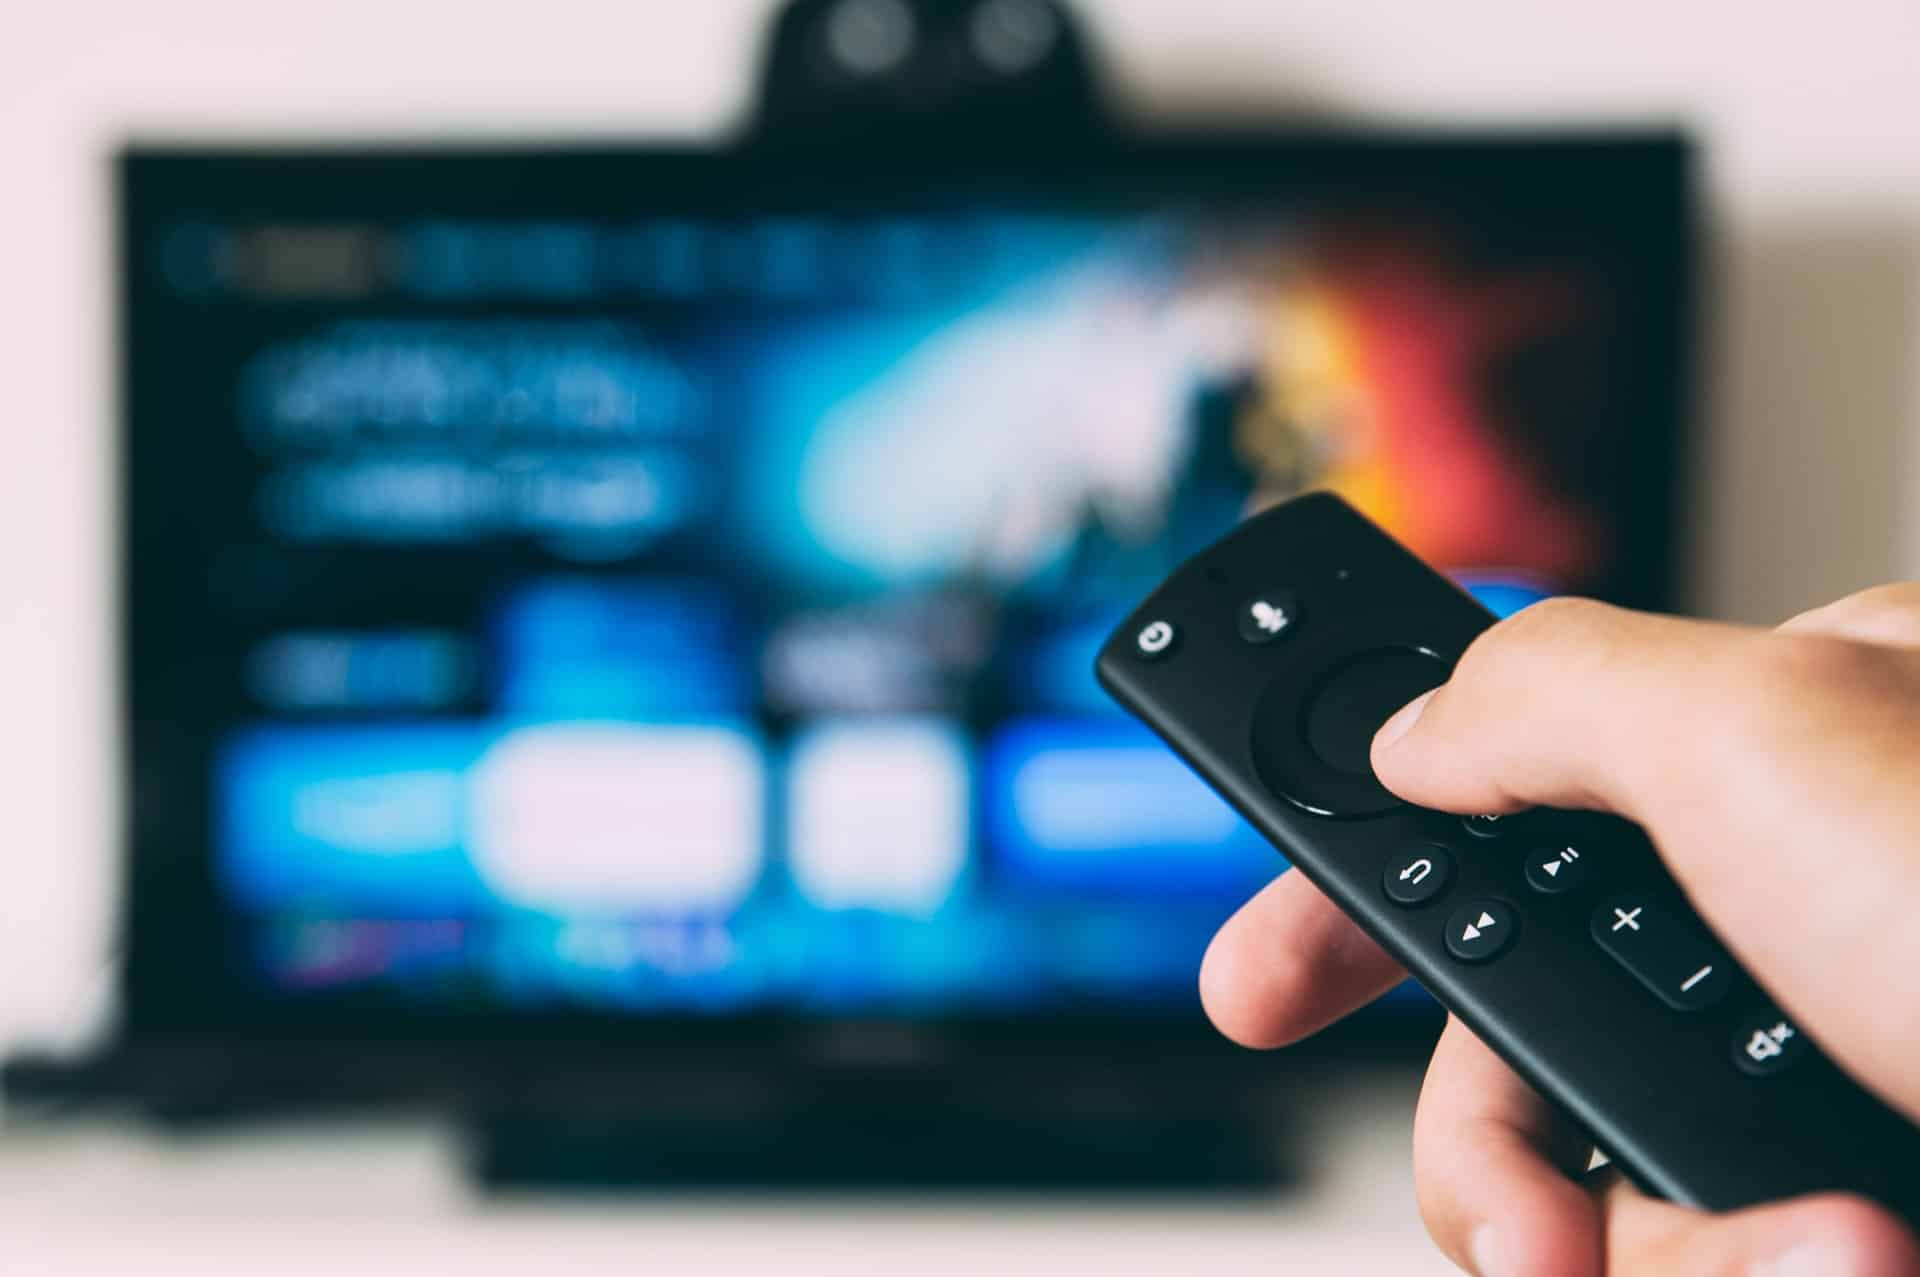 how to remote control a digital photo frame